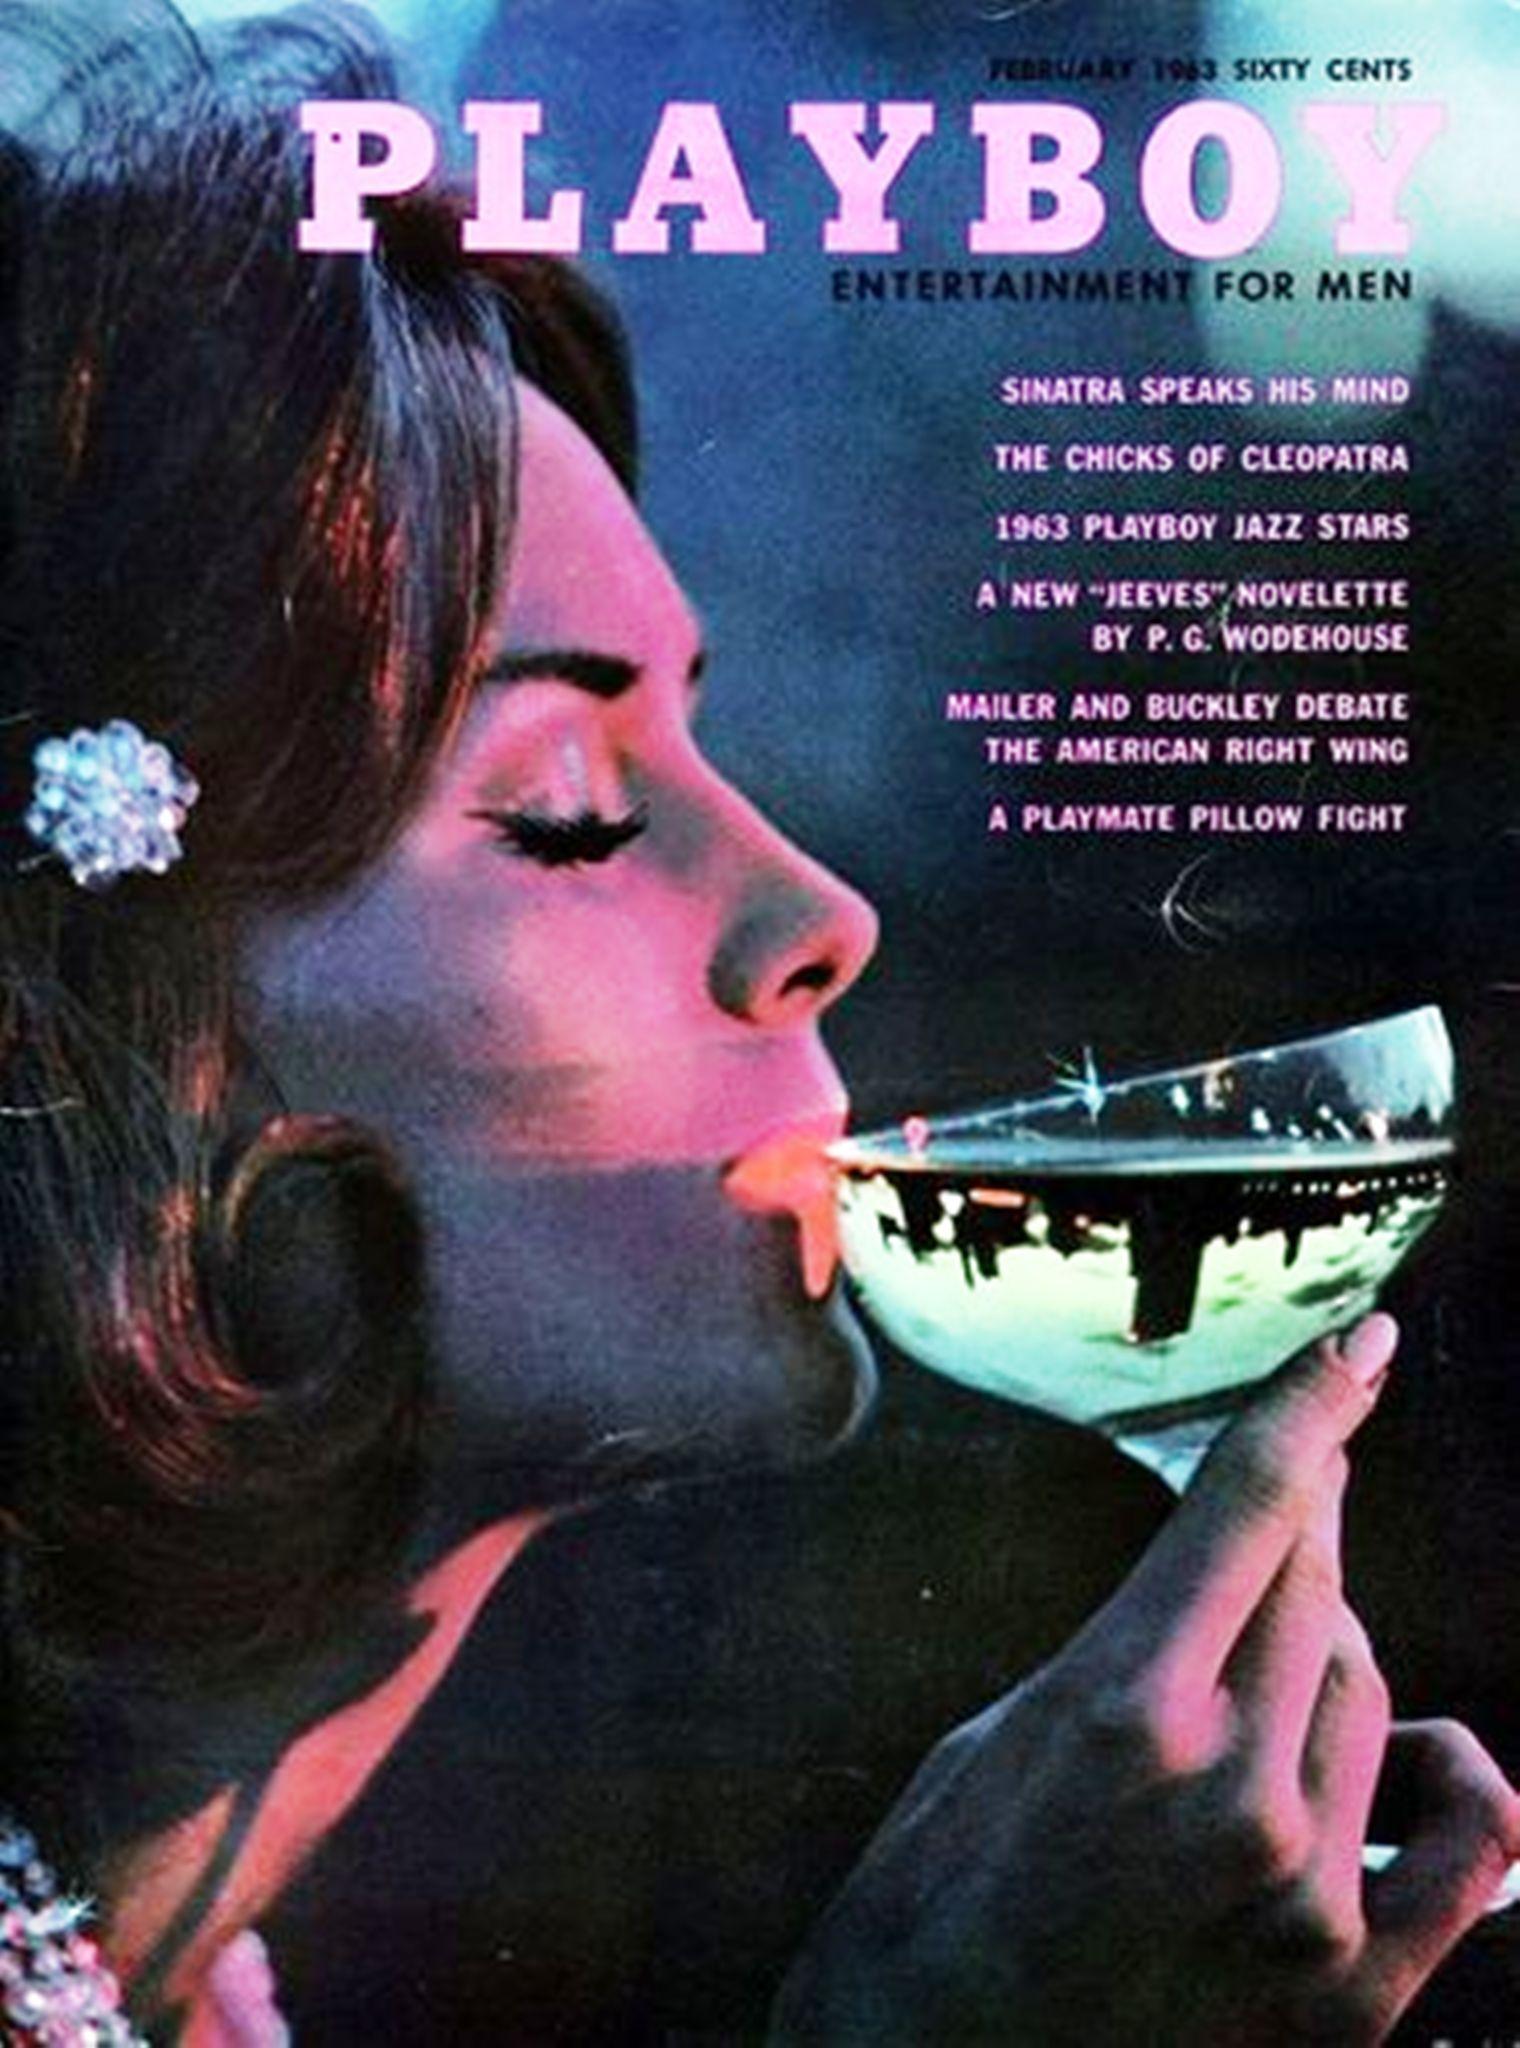 Playboy, 1963